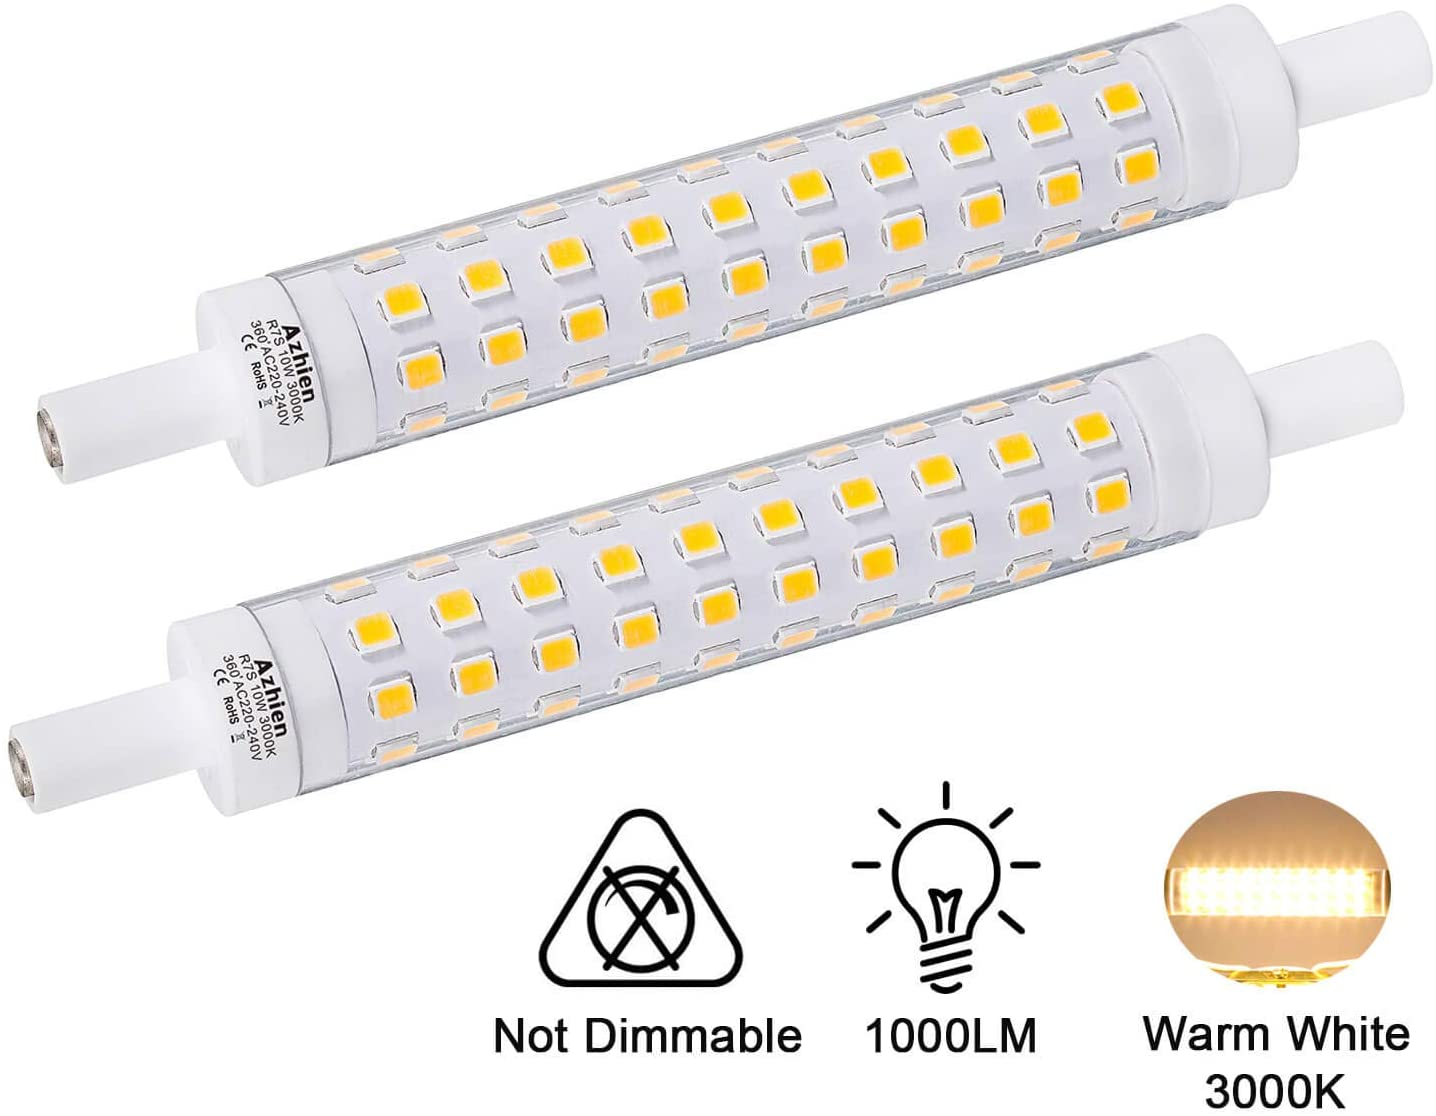 Azhien Bombilla R7S LED 10W 118mm Doble Extremo Lineal Reflector Bombilla, Luz Blanca Cálida 3000K,No regulable, Equivalente a 48W 60W 75W Lámpara Halógena, 230V AC,1000LM, 360 grados, pack de 2 [Clase de eficiencia energética A++]